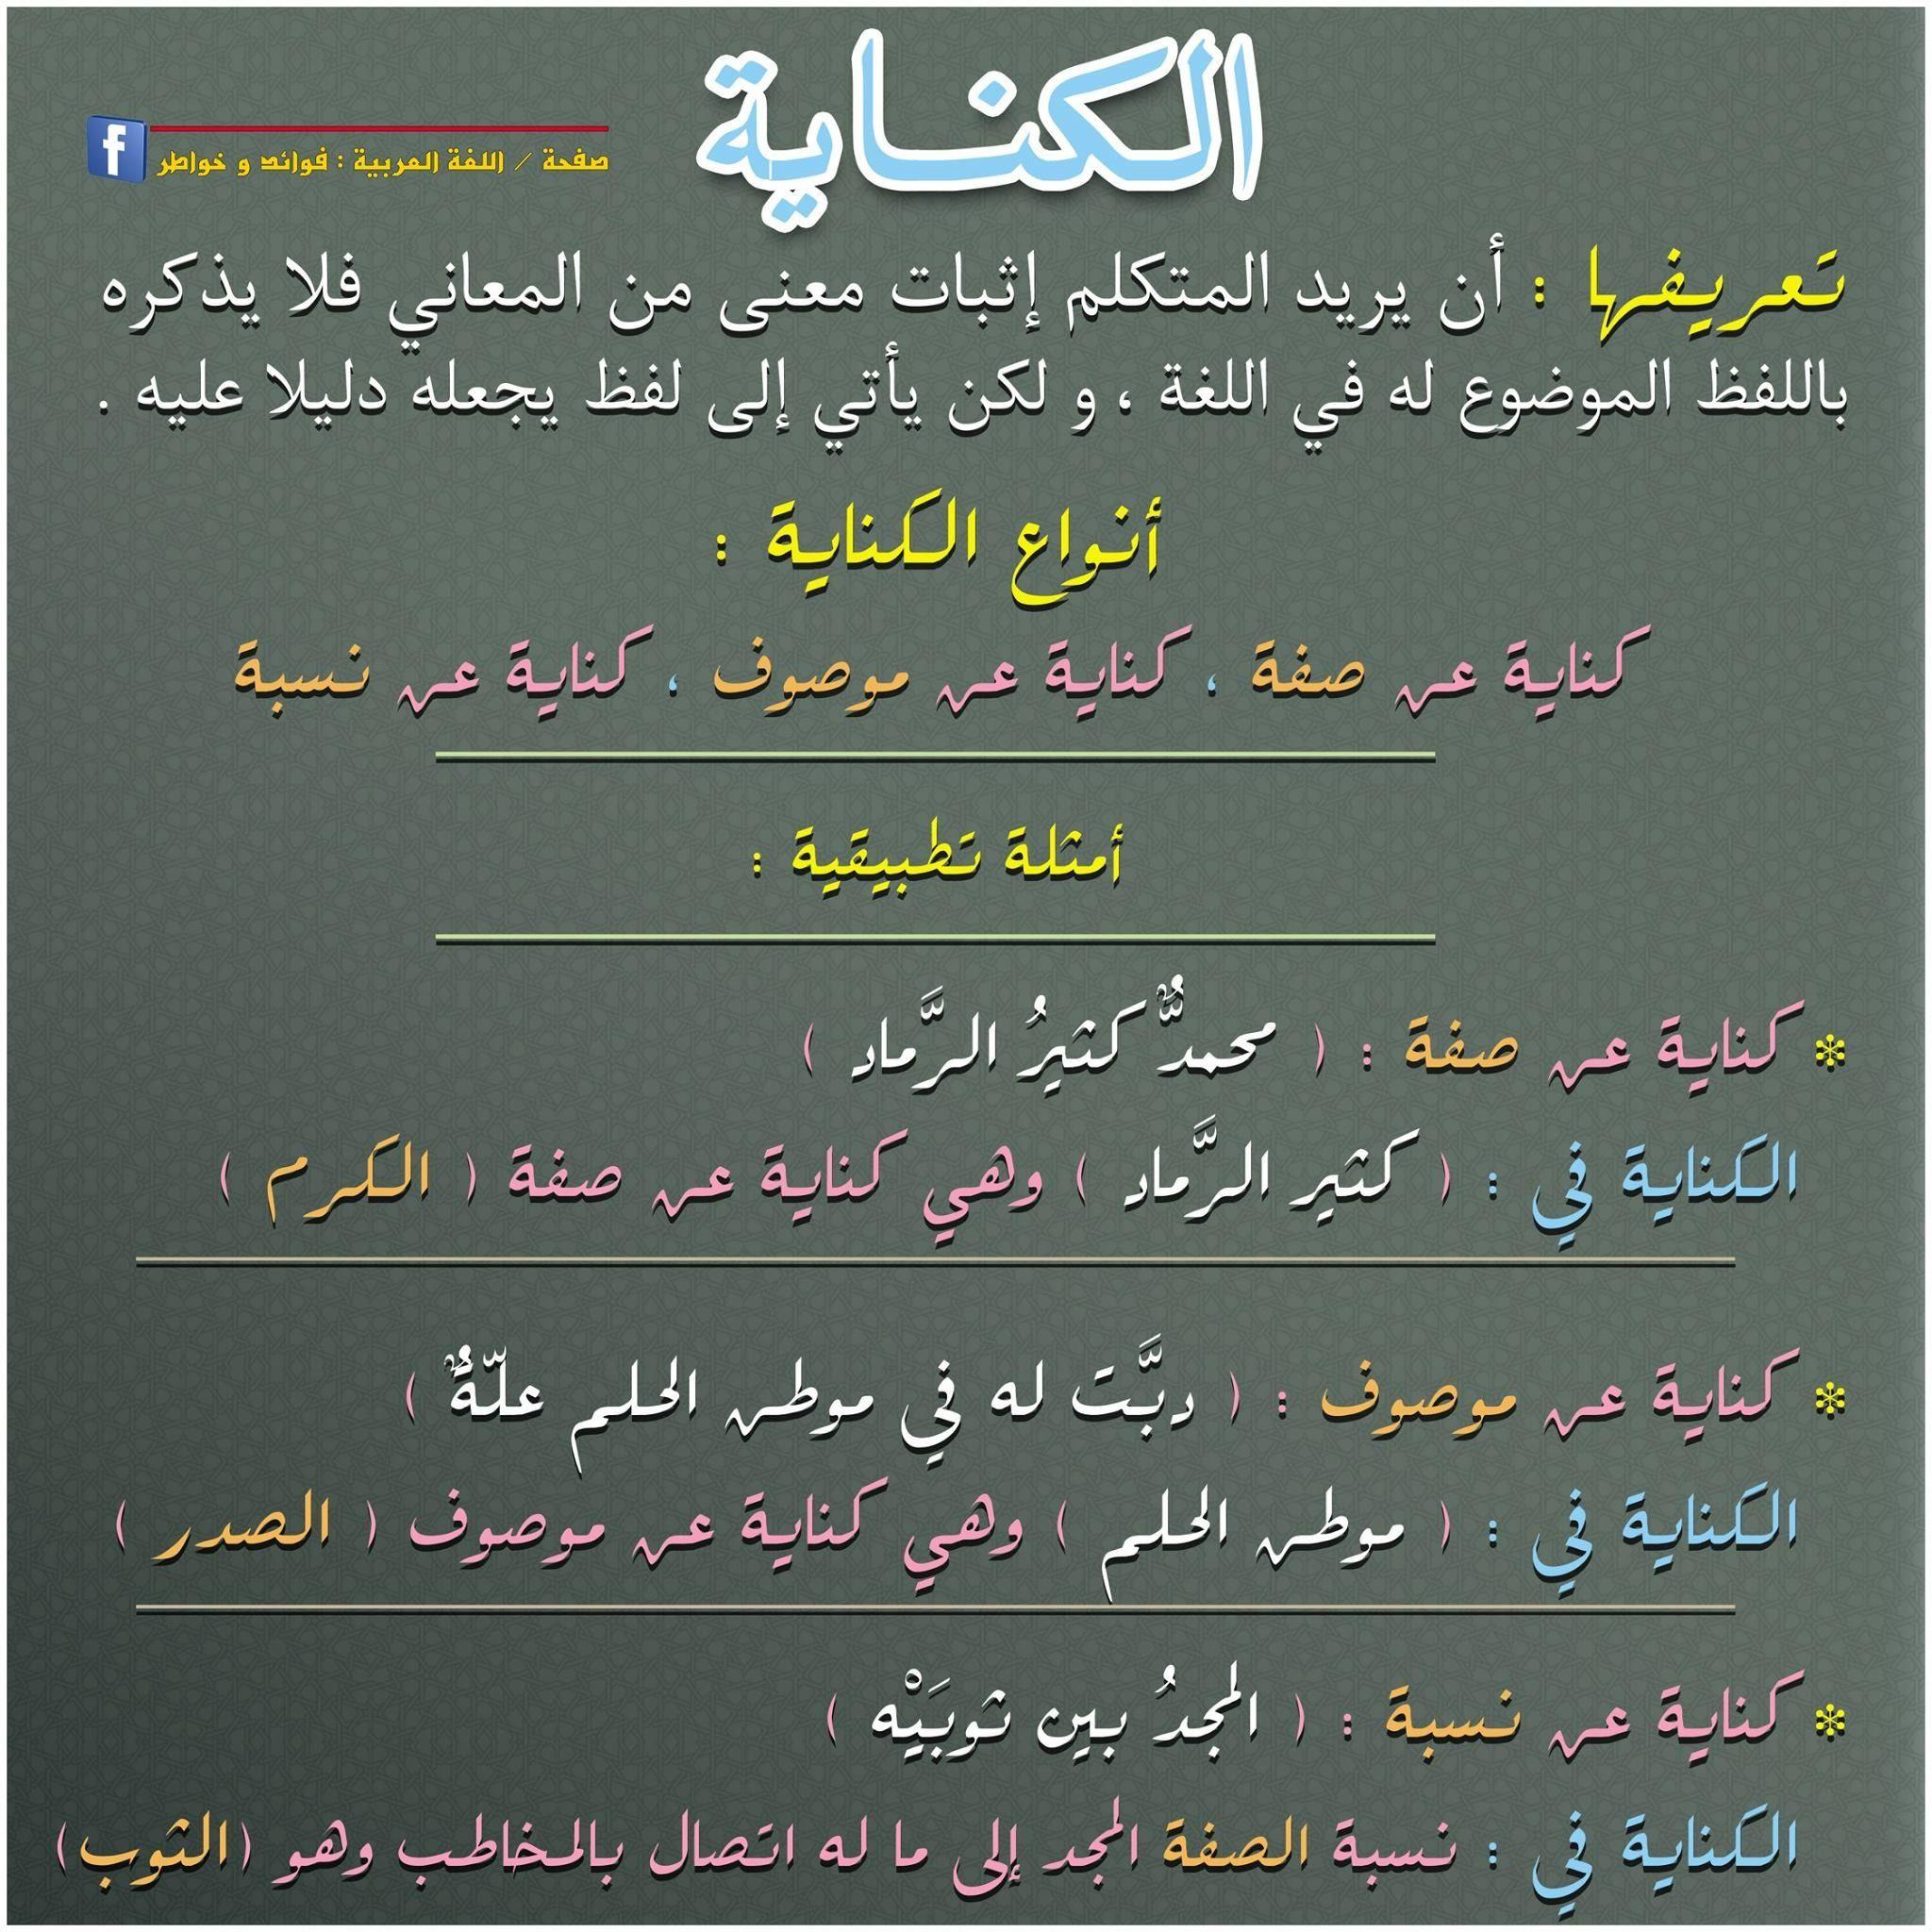 Pin By Silvana El Haddad On لغتنا العربية Arabic Script Arabic Language Learning Arabic